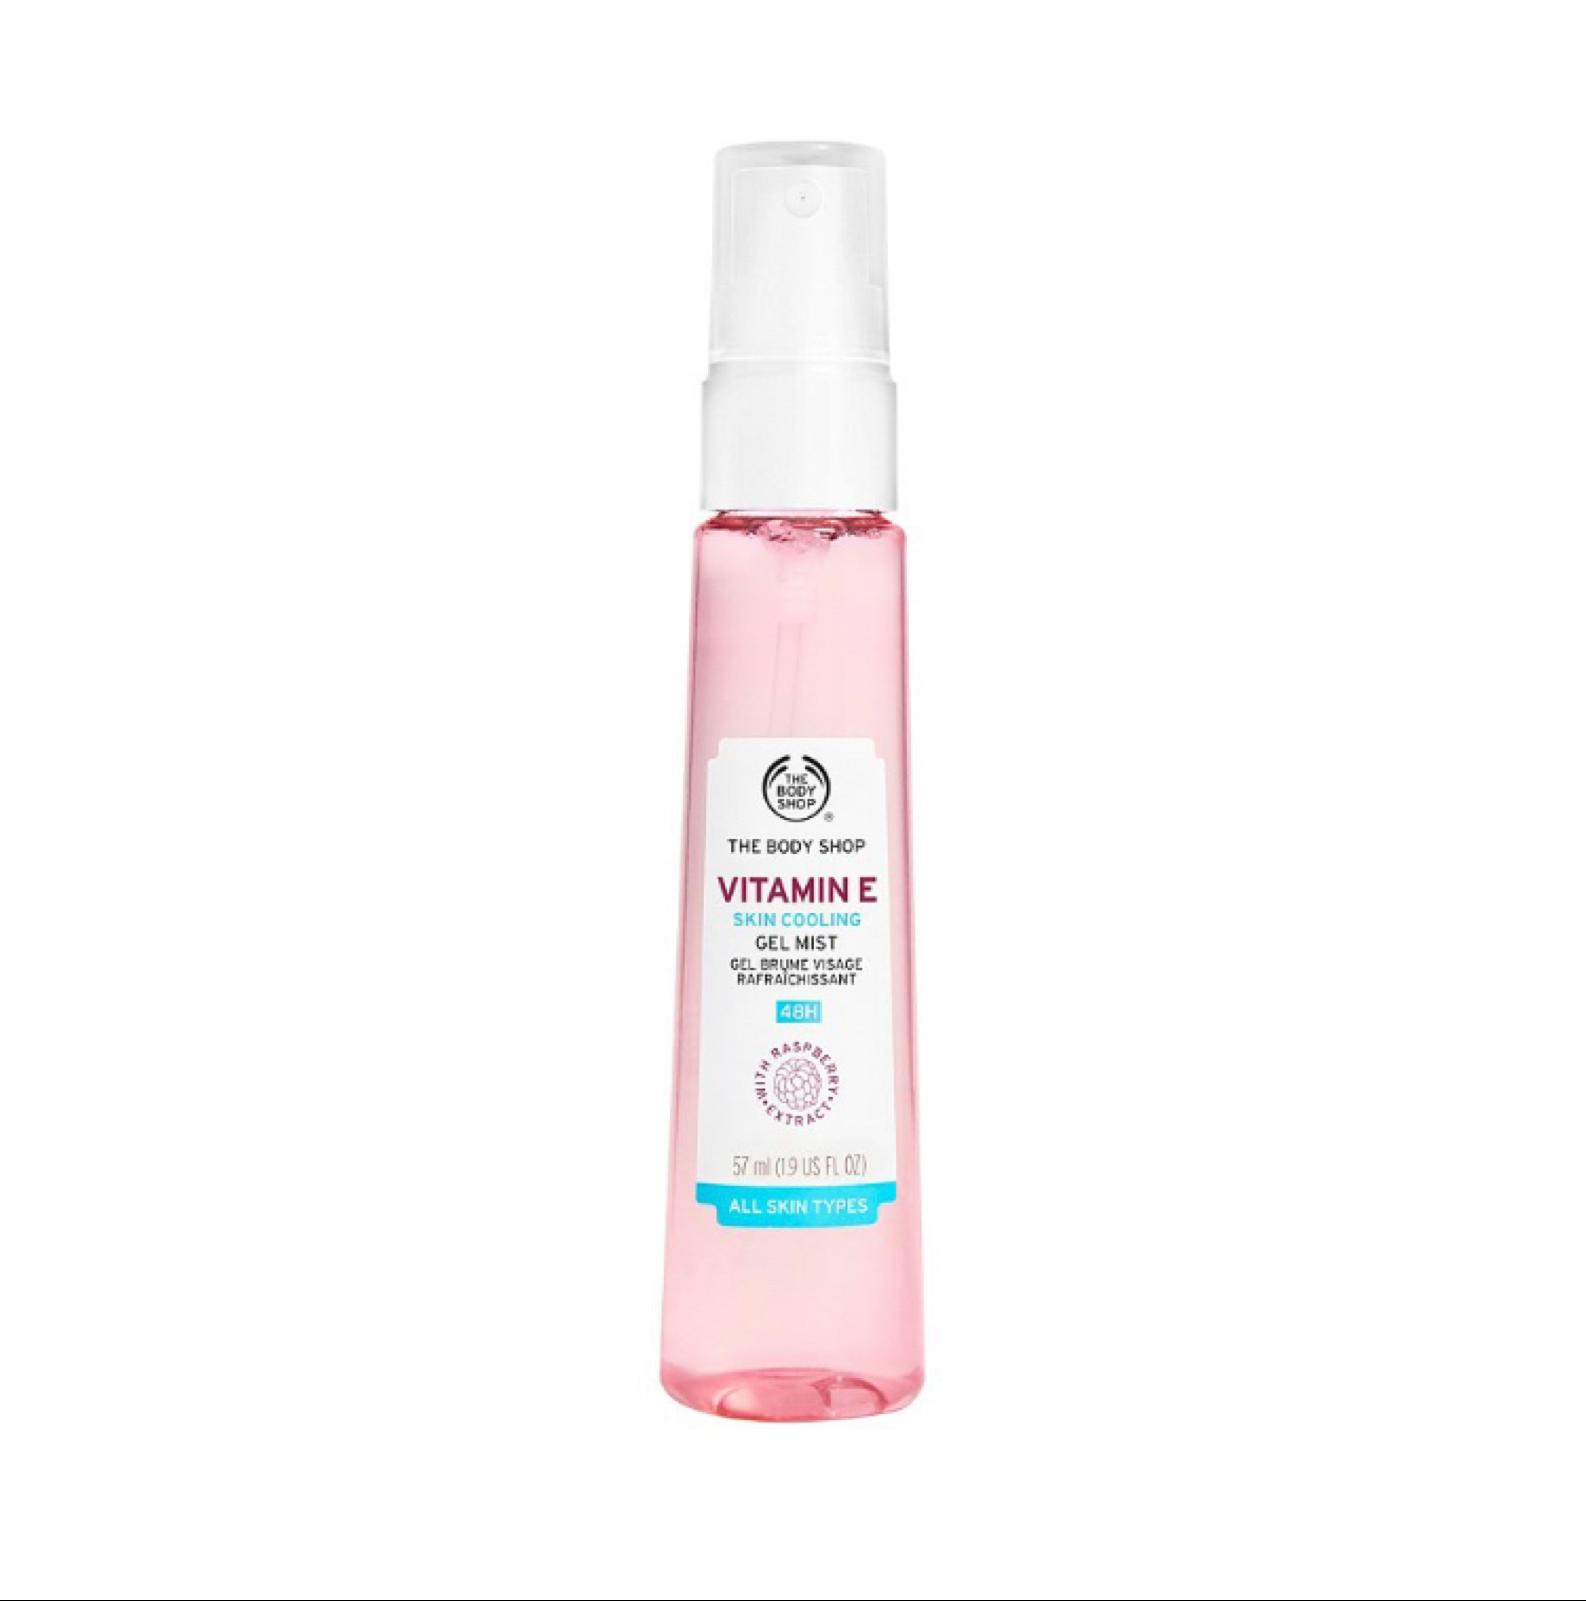 The Body Shop Vitamin E Skin Cooling Gel Mist